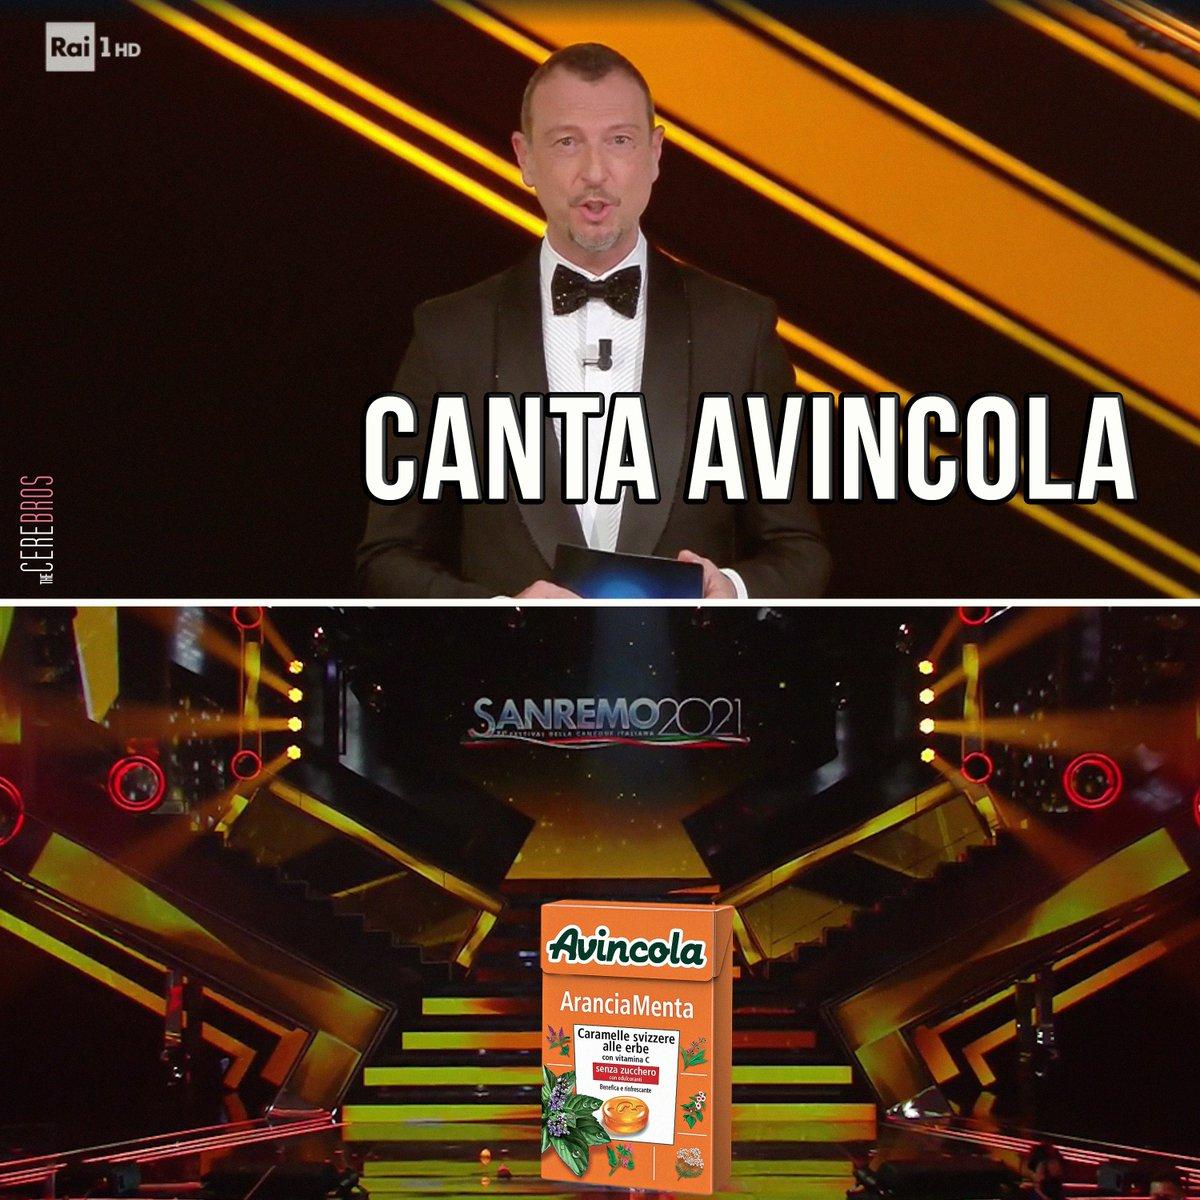 #avincola